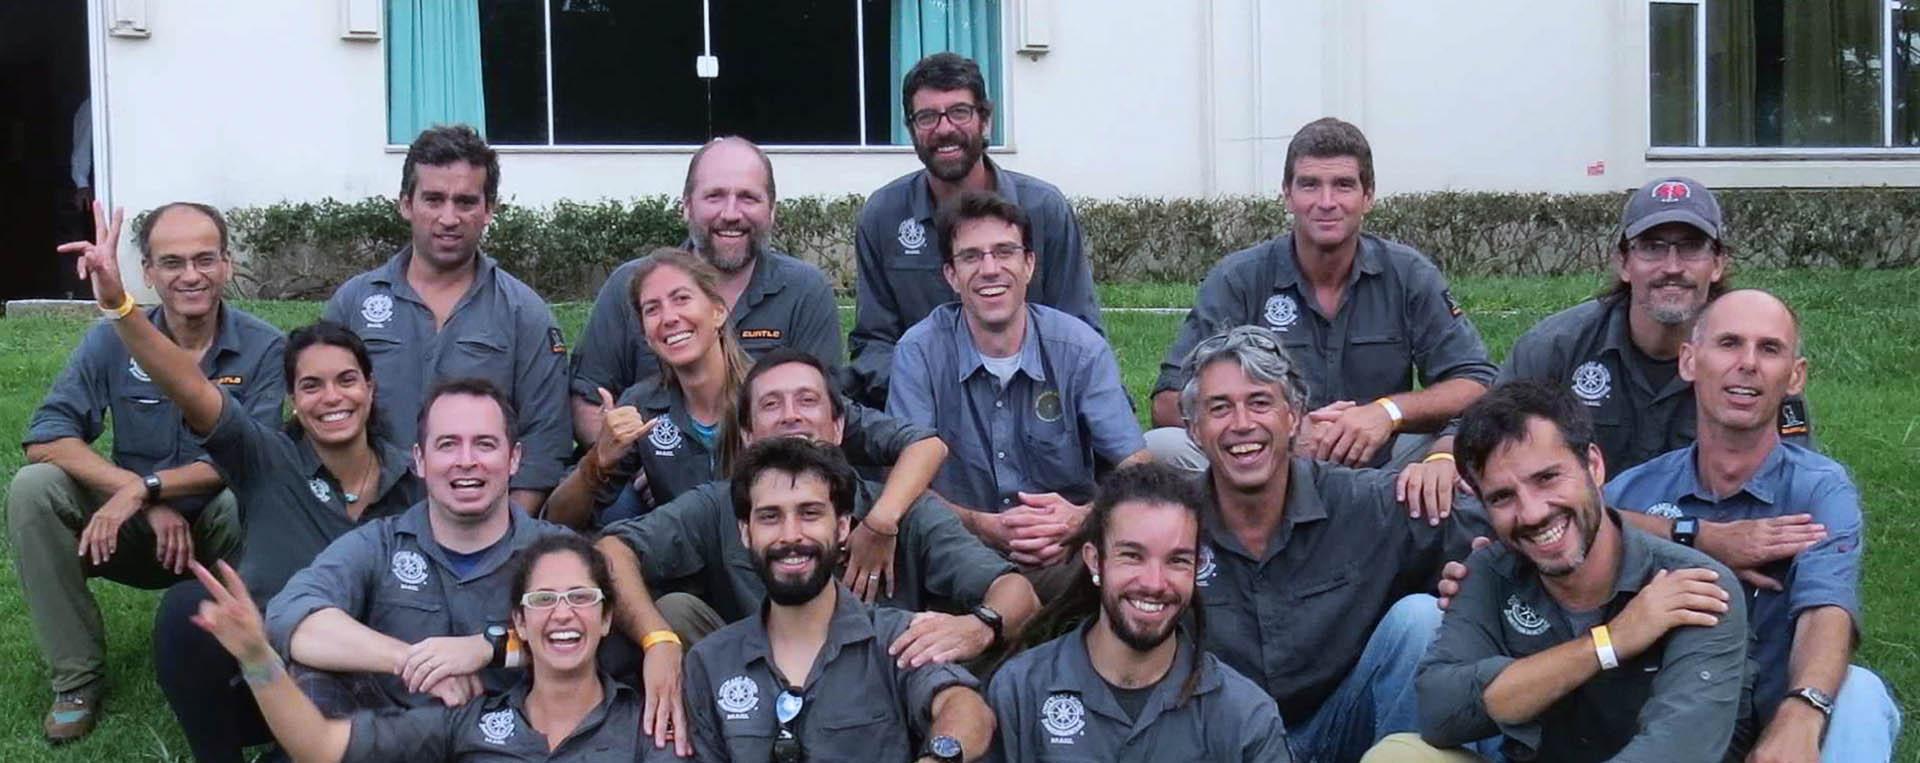 Foto da equipe da ONG Outward Bound Brasil